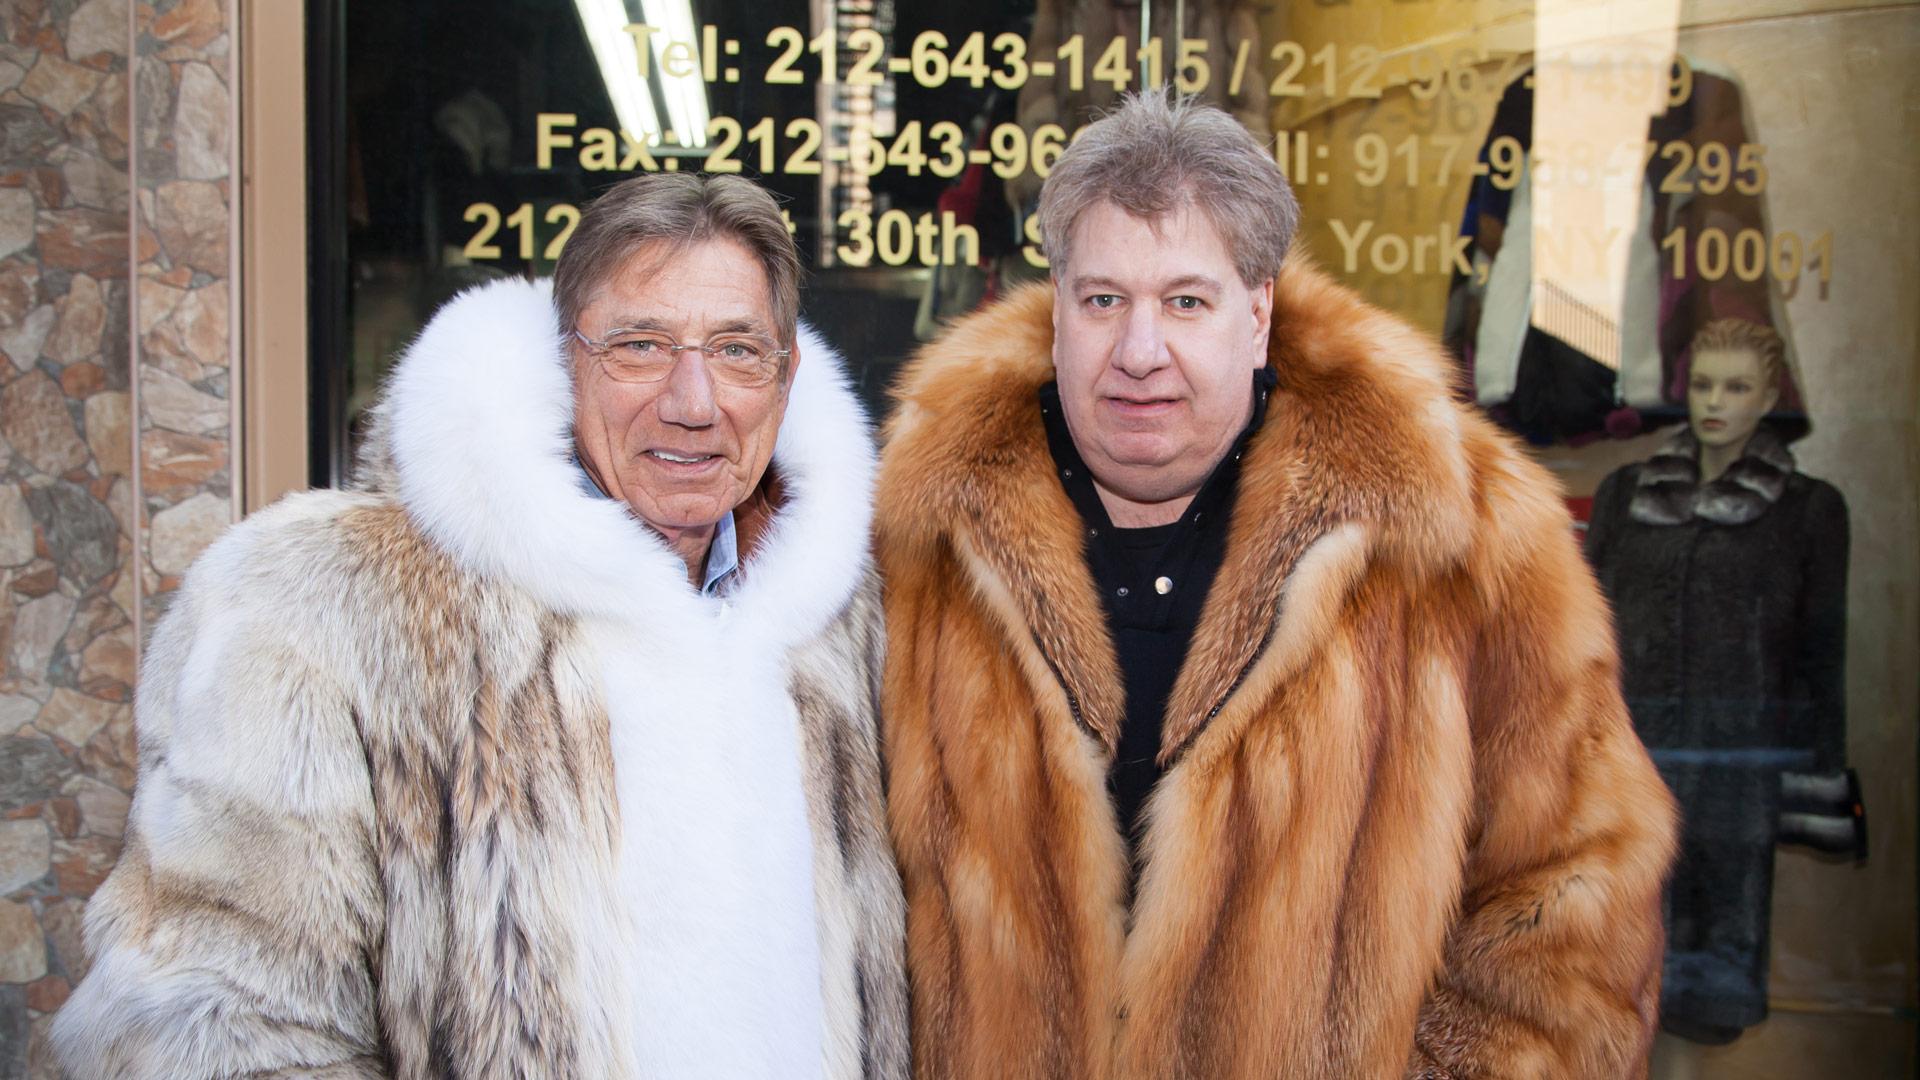 Fur Coats For Everyone